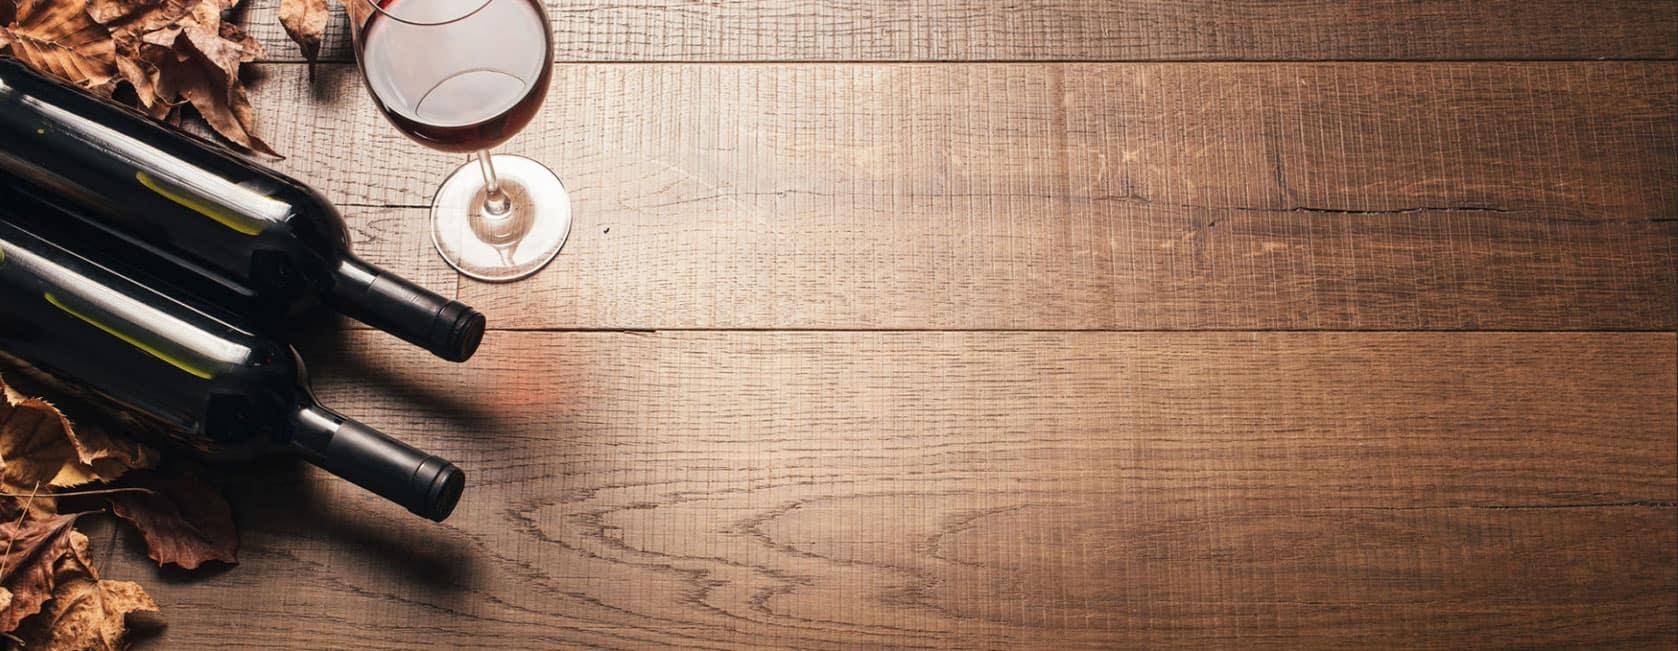 Lideres sector vitivinicola